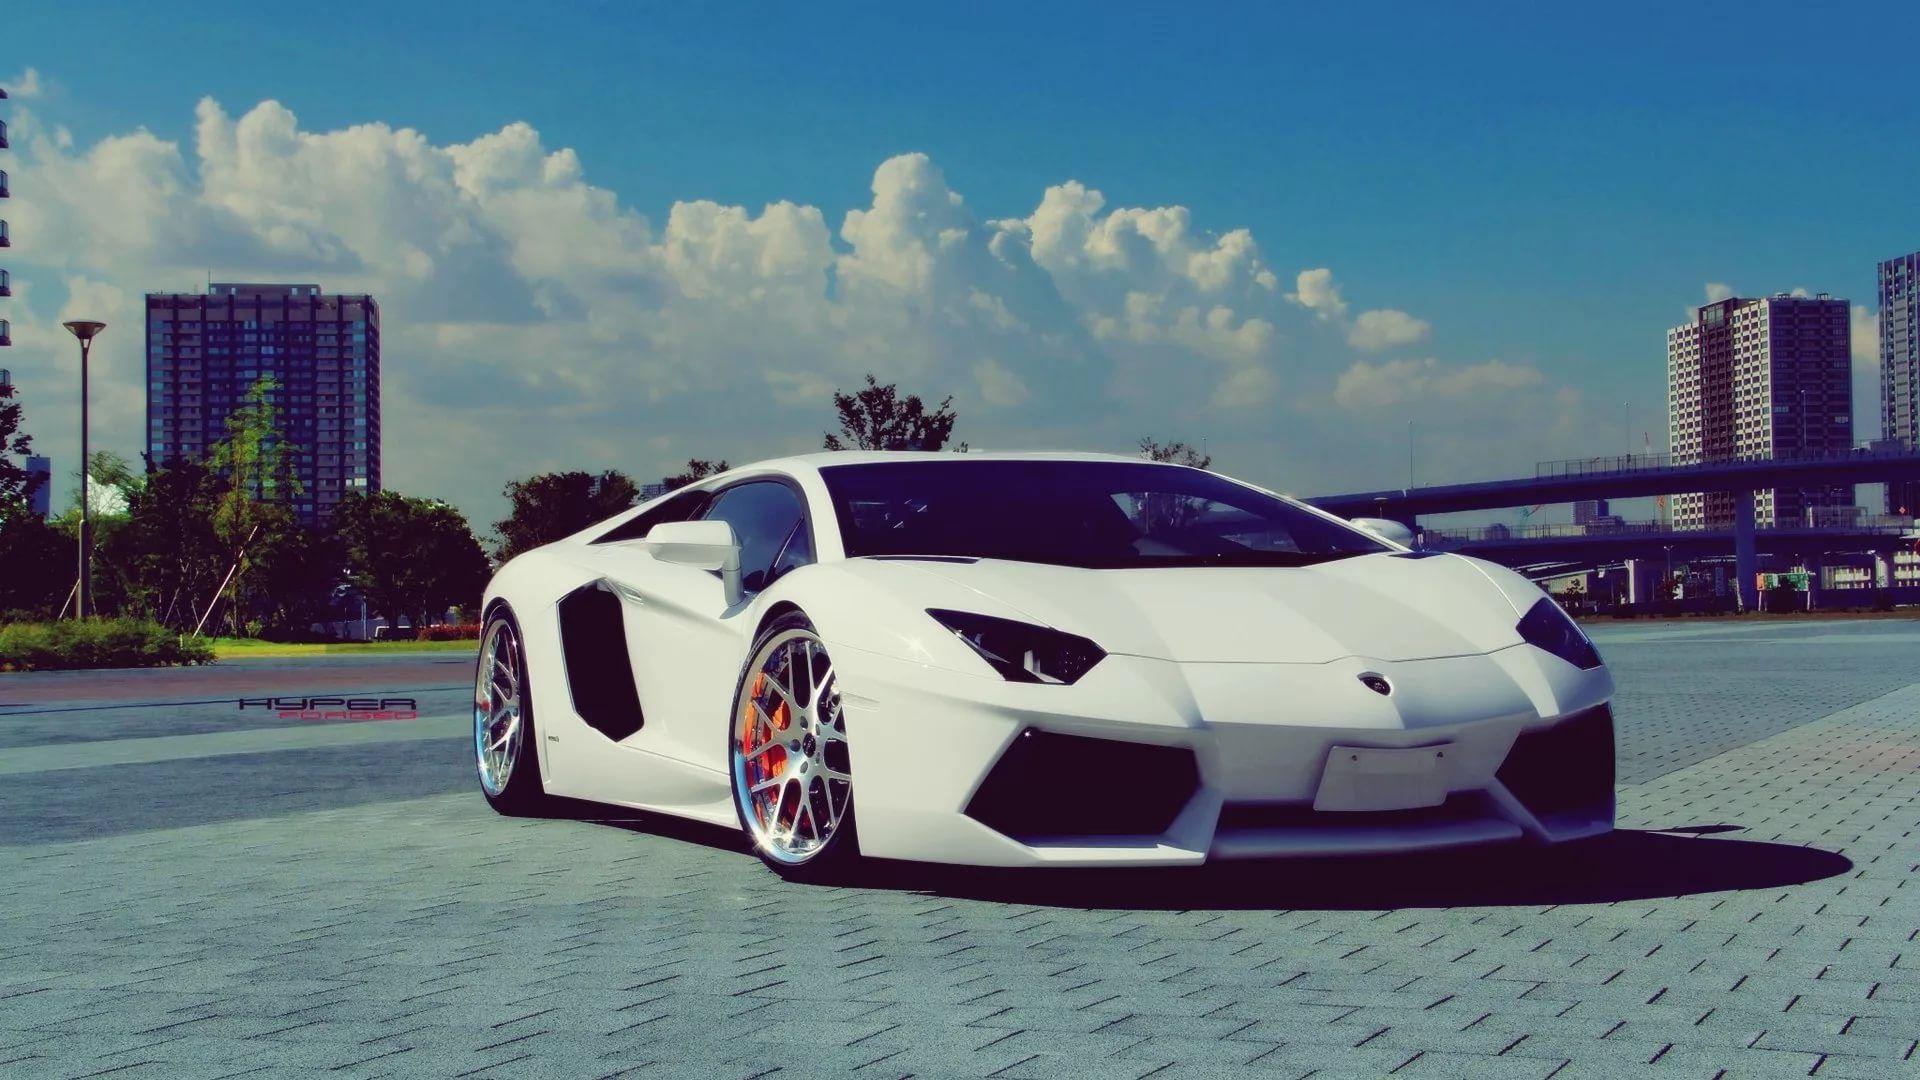 Lamborghini Cool Wallpaper